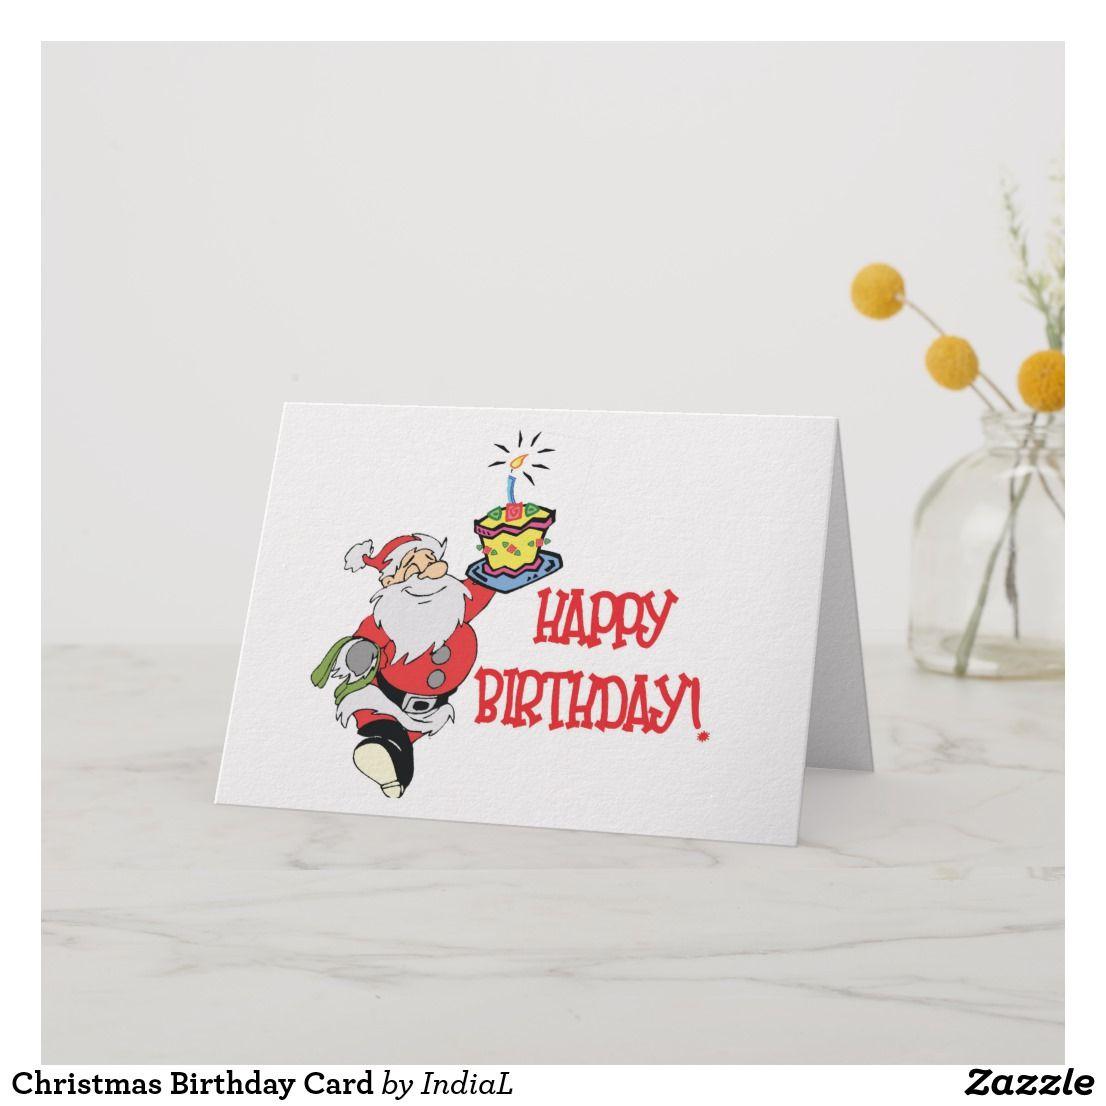 Christmas Birthday Card Zazzle Com Christmas Birthday Cards Holiday Design Card Birthday Cards